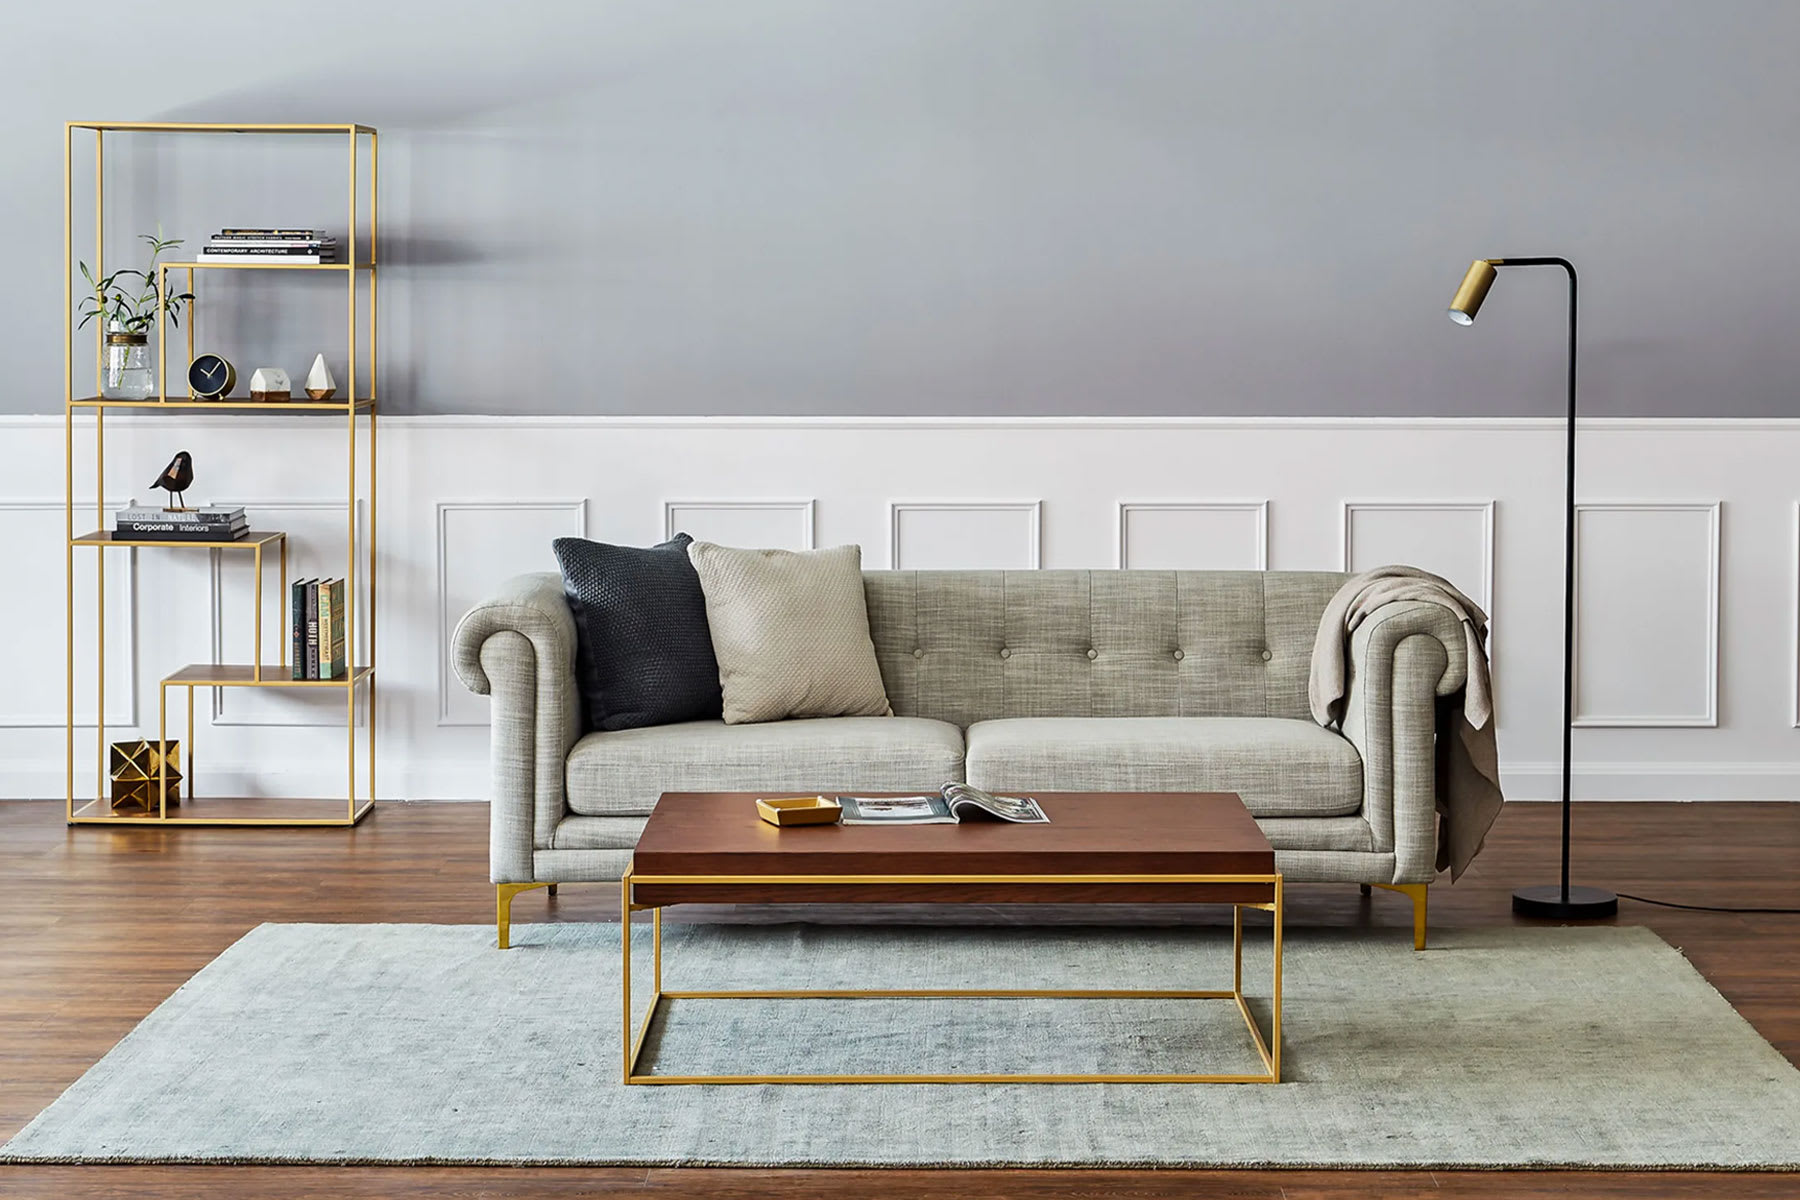 modern living room with sofa, coffee table and shelf